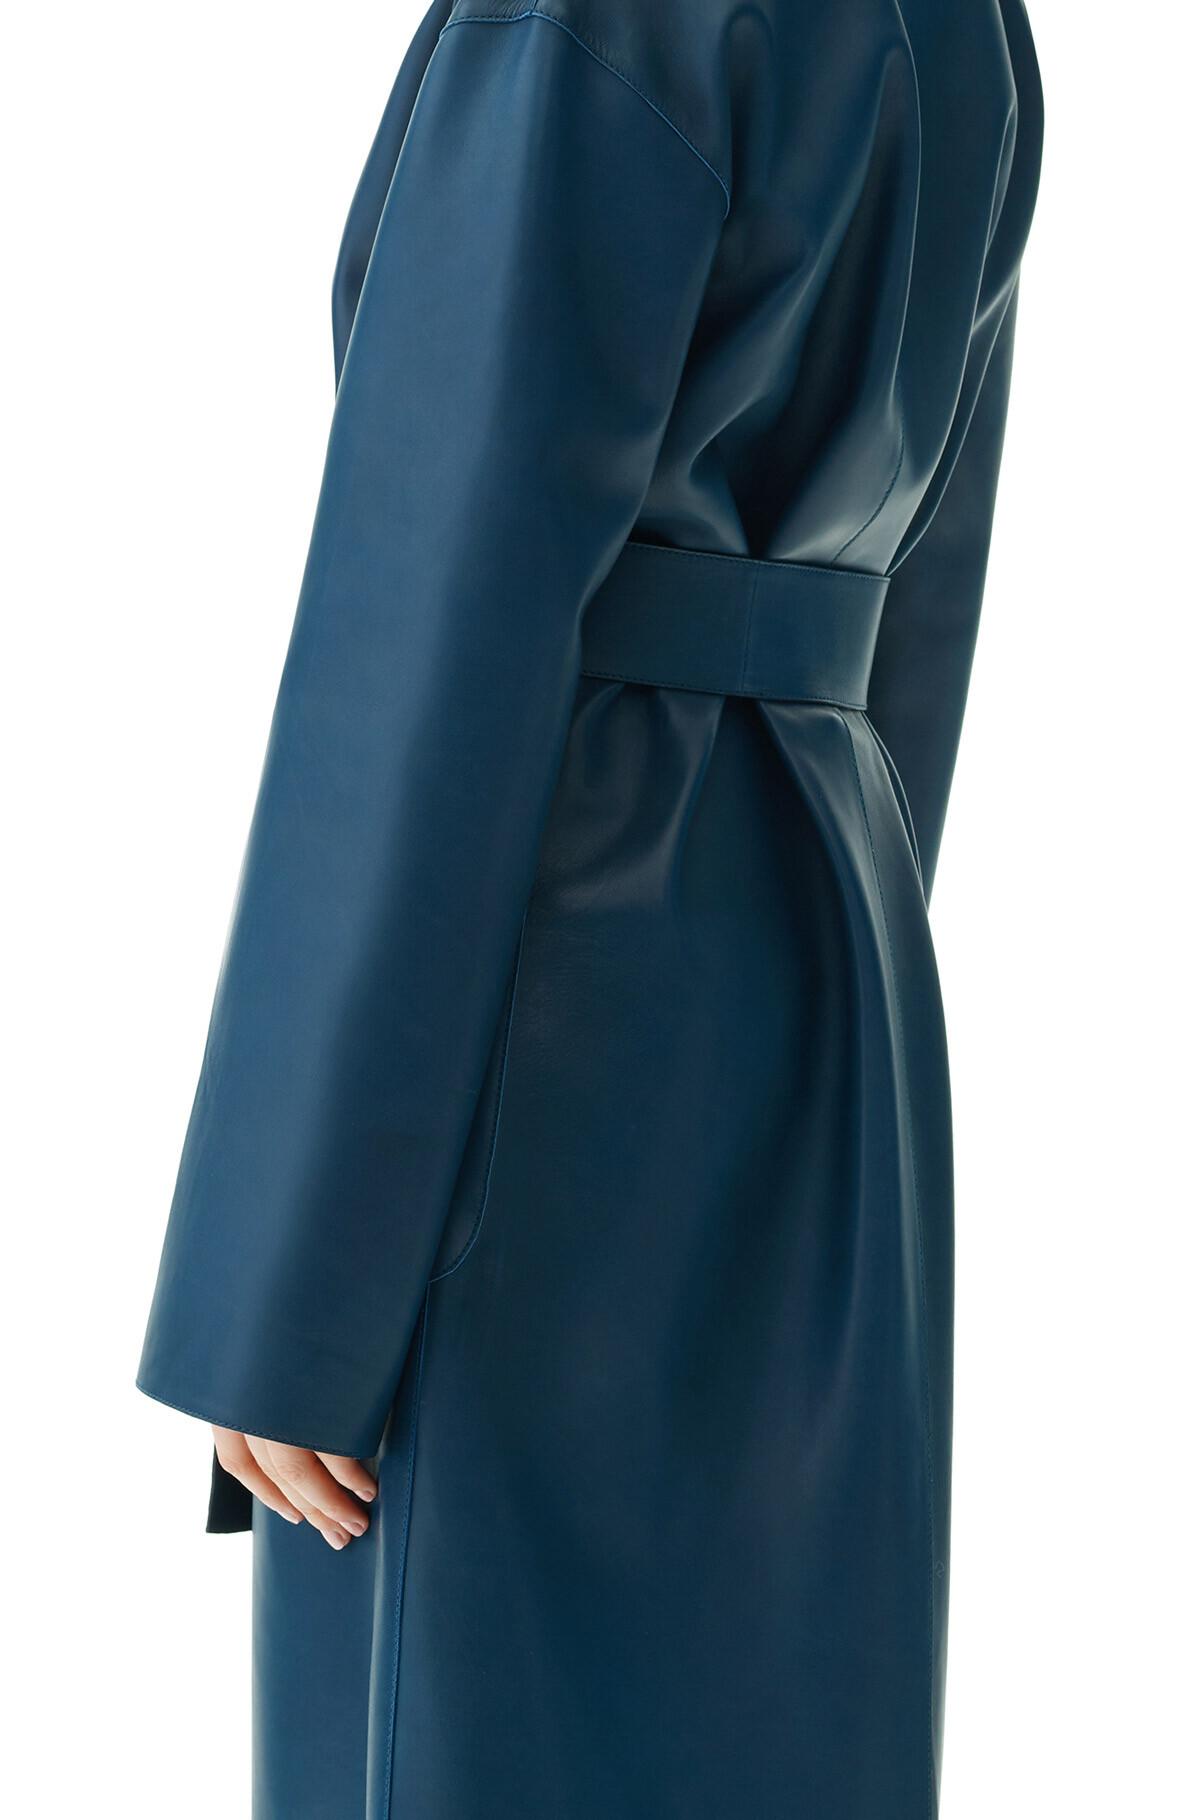 LOEWE Chaqueton Azul Varsity front